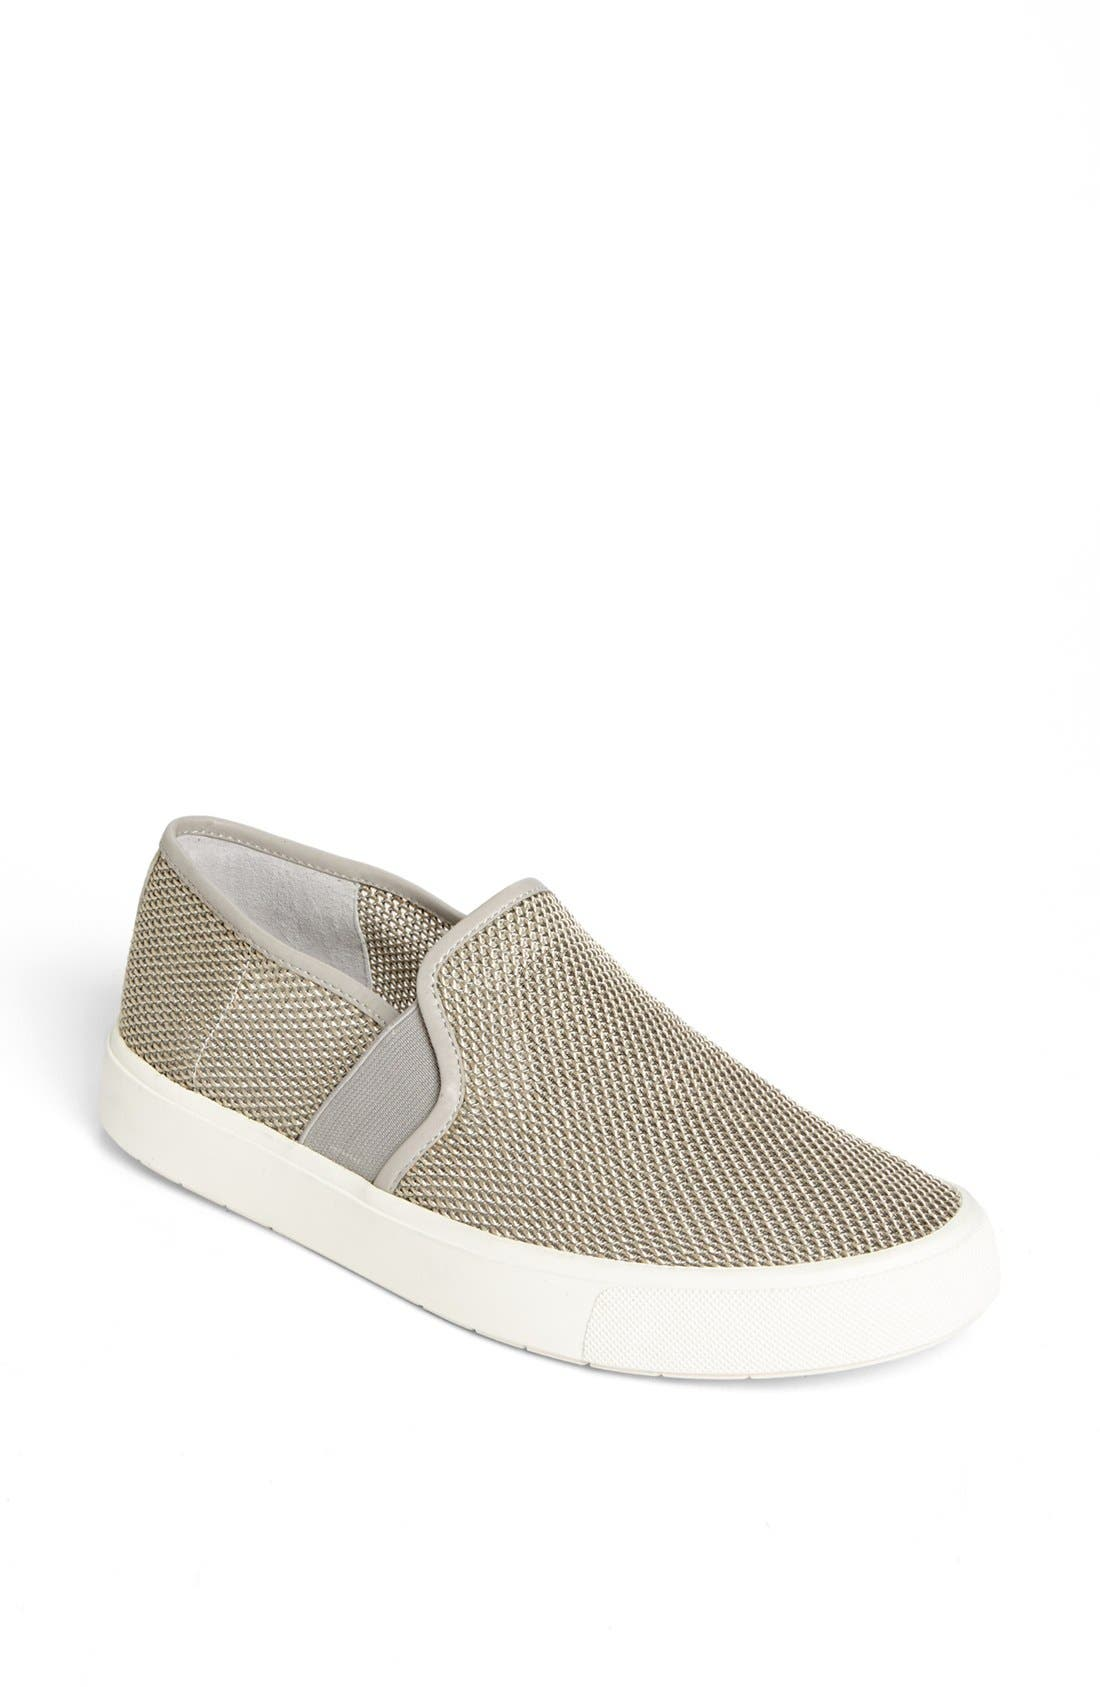 Main Image - Vince 'Blair 8' Slip-On Sneaker